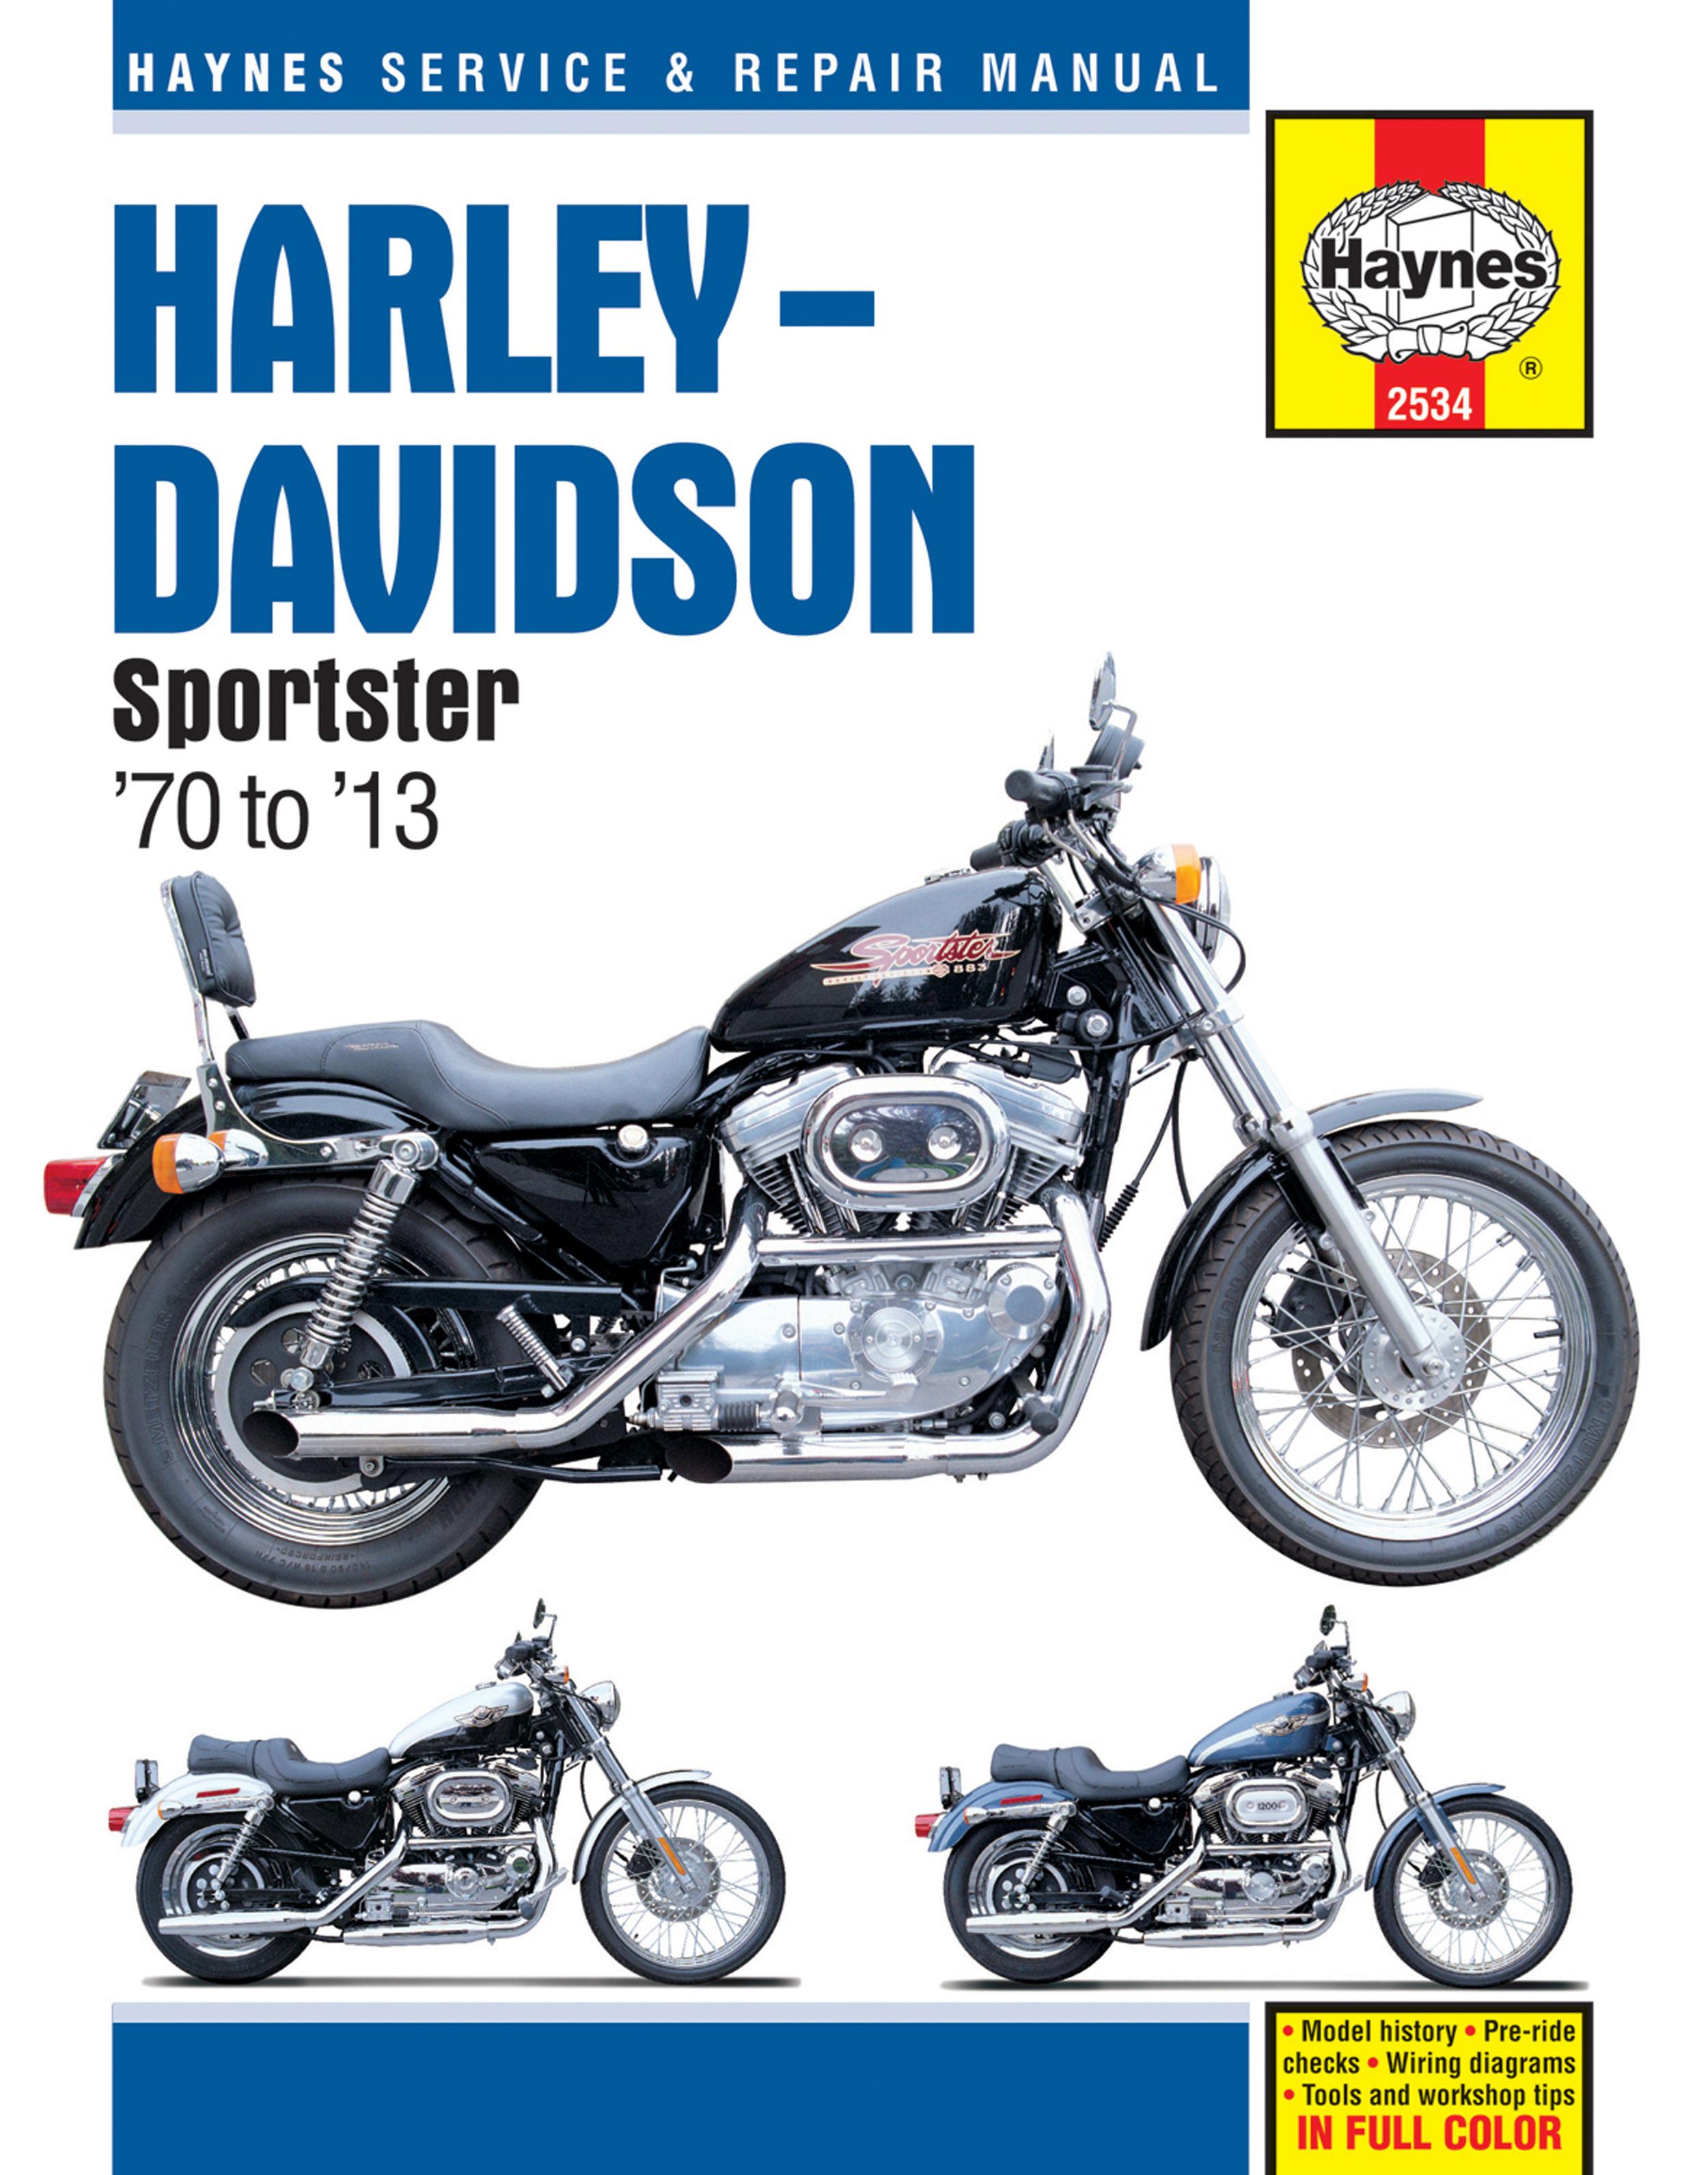 HAYNES Repair Manual - Harley-Davidson Sportster XL, XLH, XLCH, XLS, on